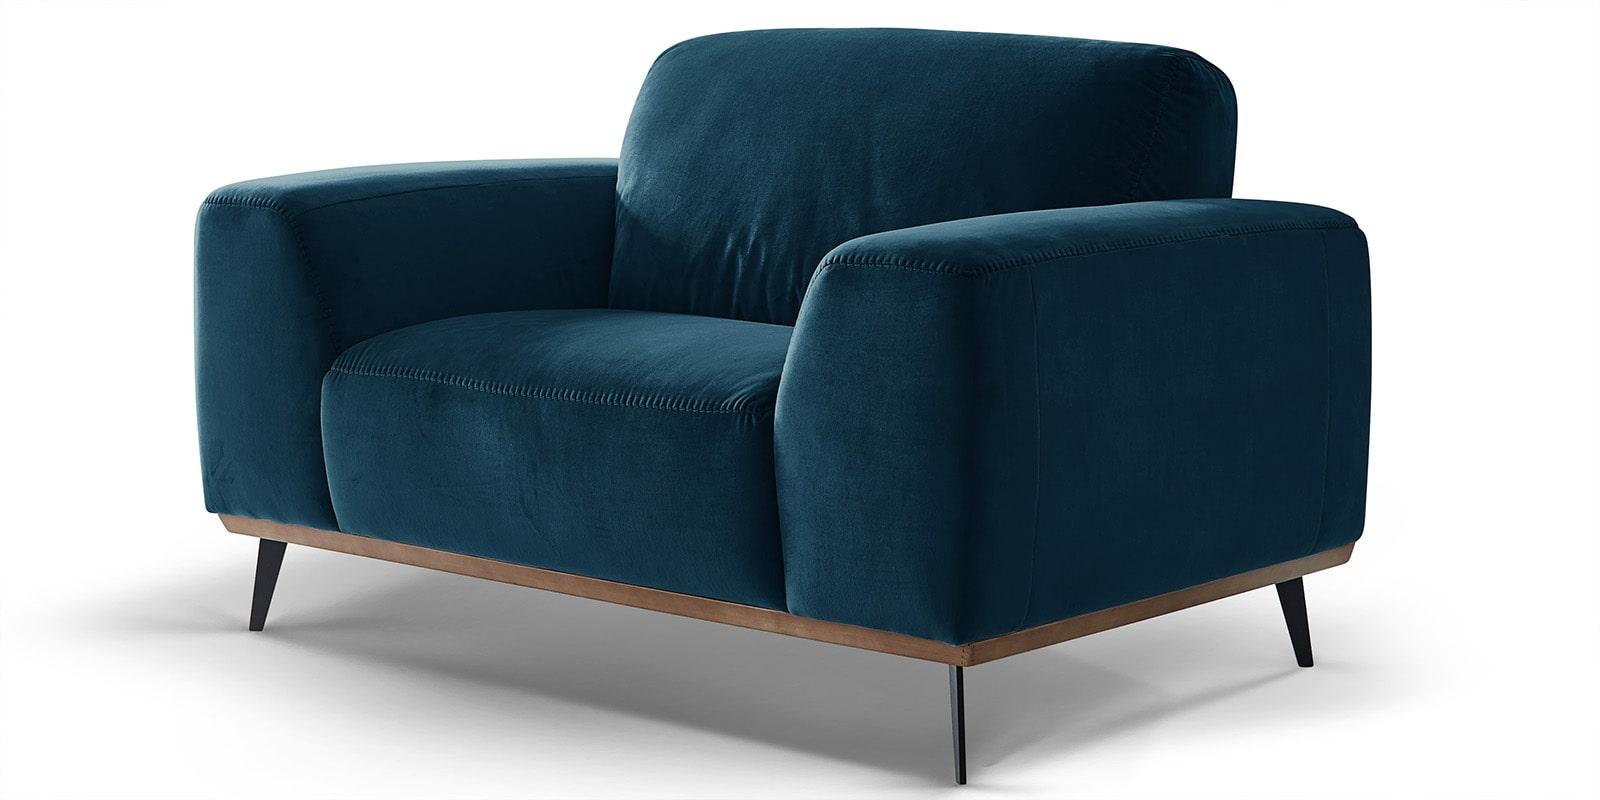 Moebella24 - 1-Sitzer - Sofa - Sessel - Barcelona - Samt - Türkis - Skandinavisches - Design - Punto - cavallo - Nähte - Detailaufnahme